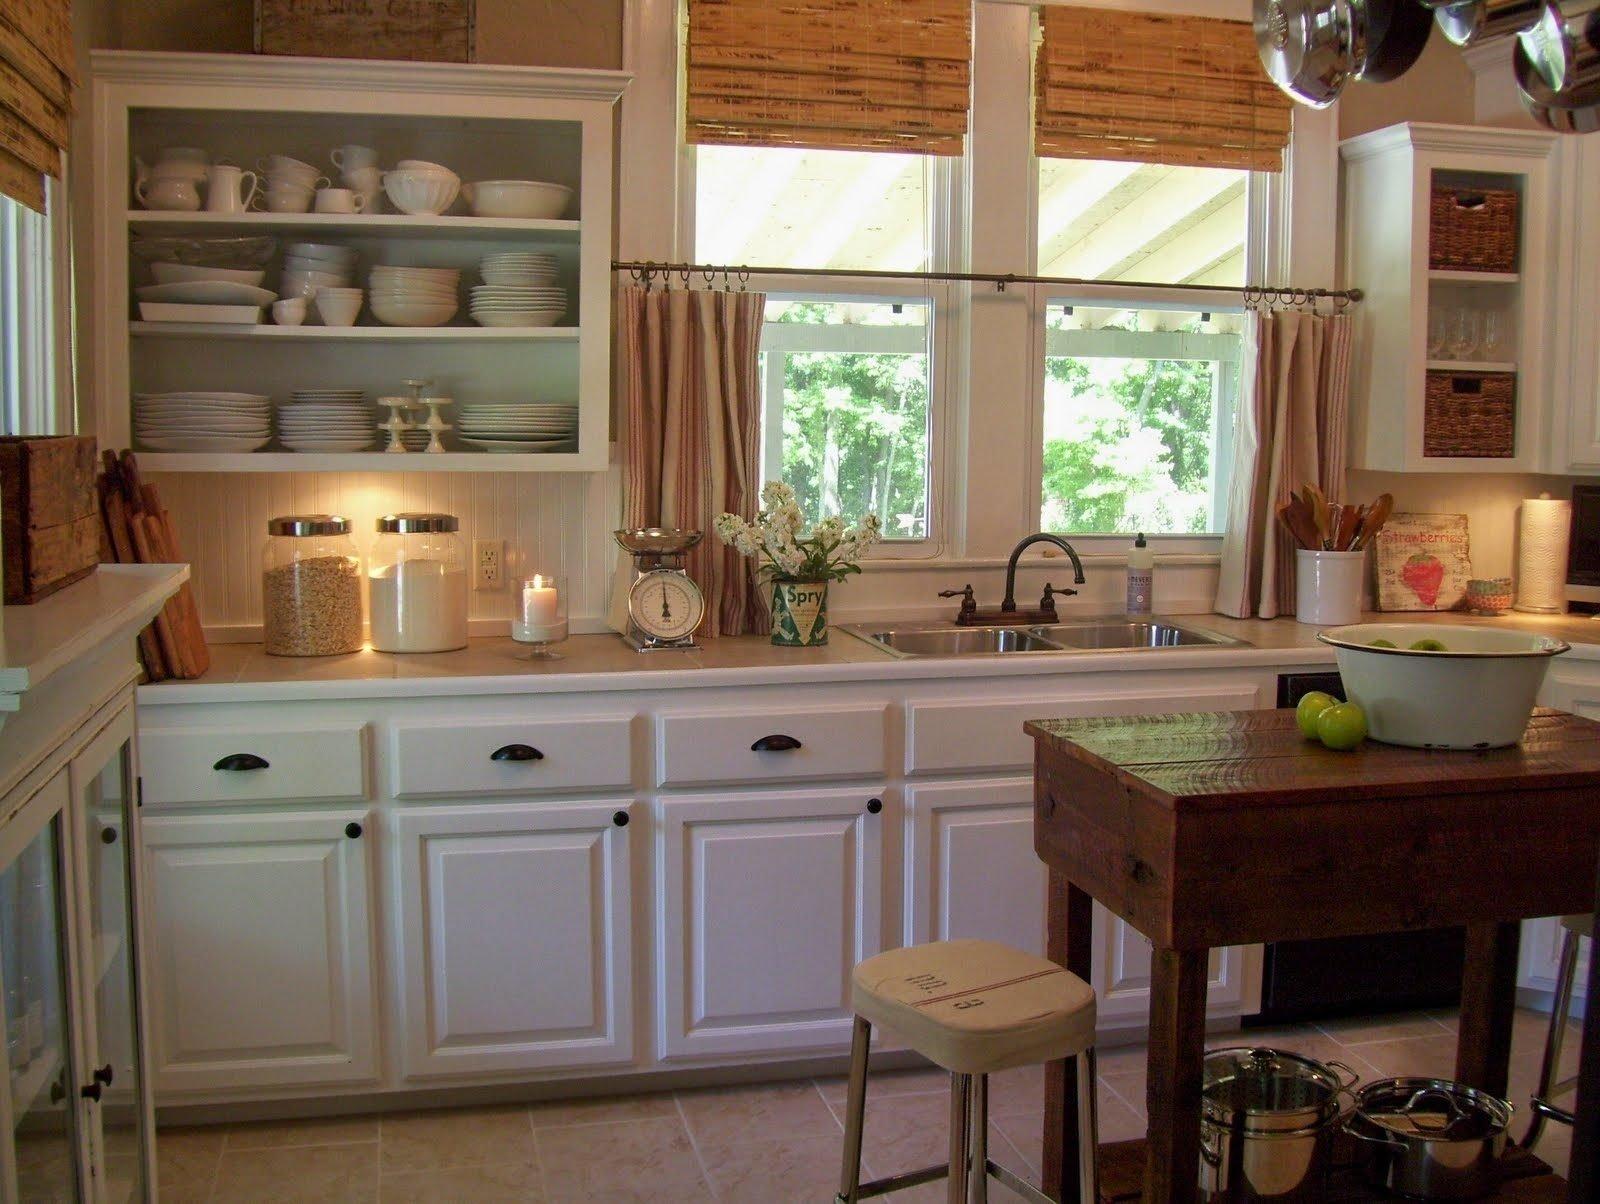 10 Most Popular Country Kitchen Decorating Ideas On A Budget country kitchen decorating ideas on a budget round white modern 2020